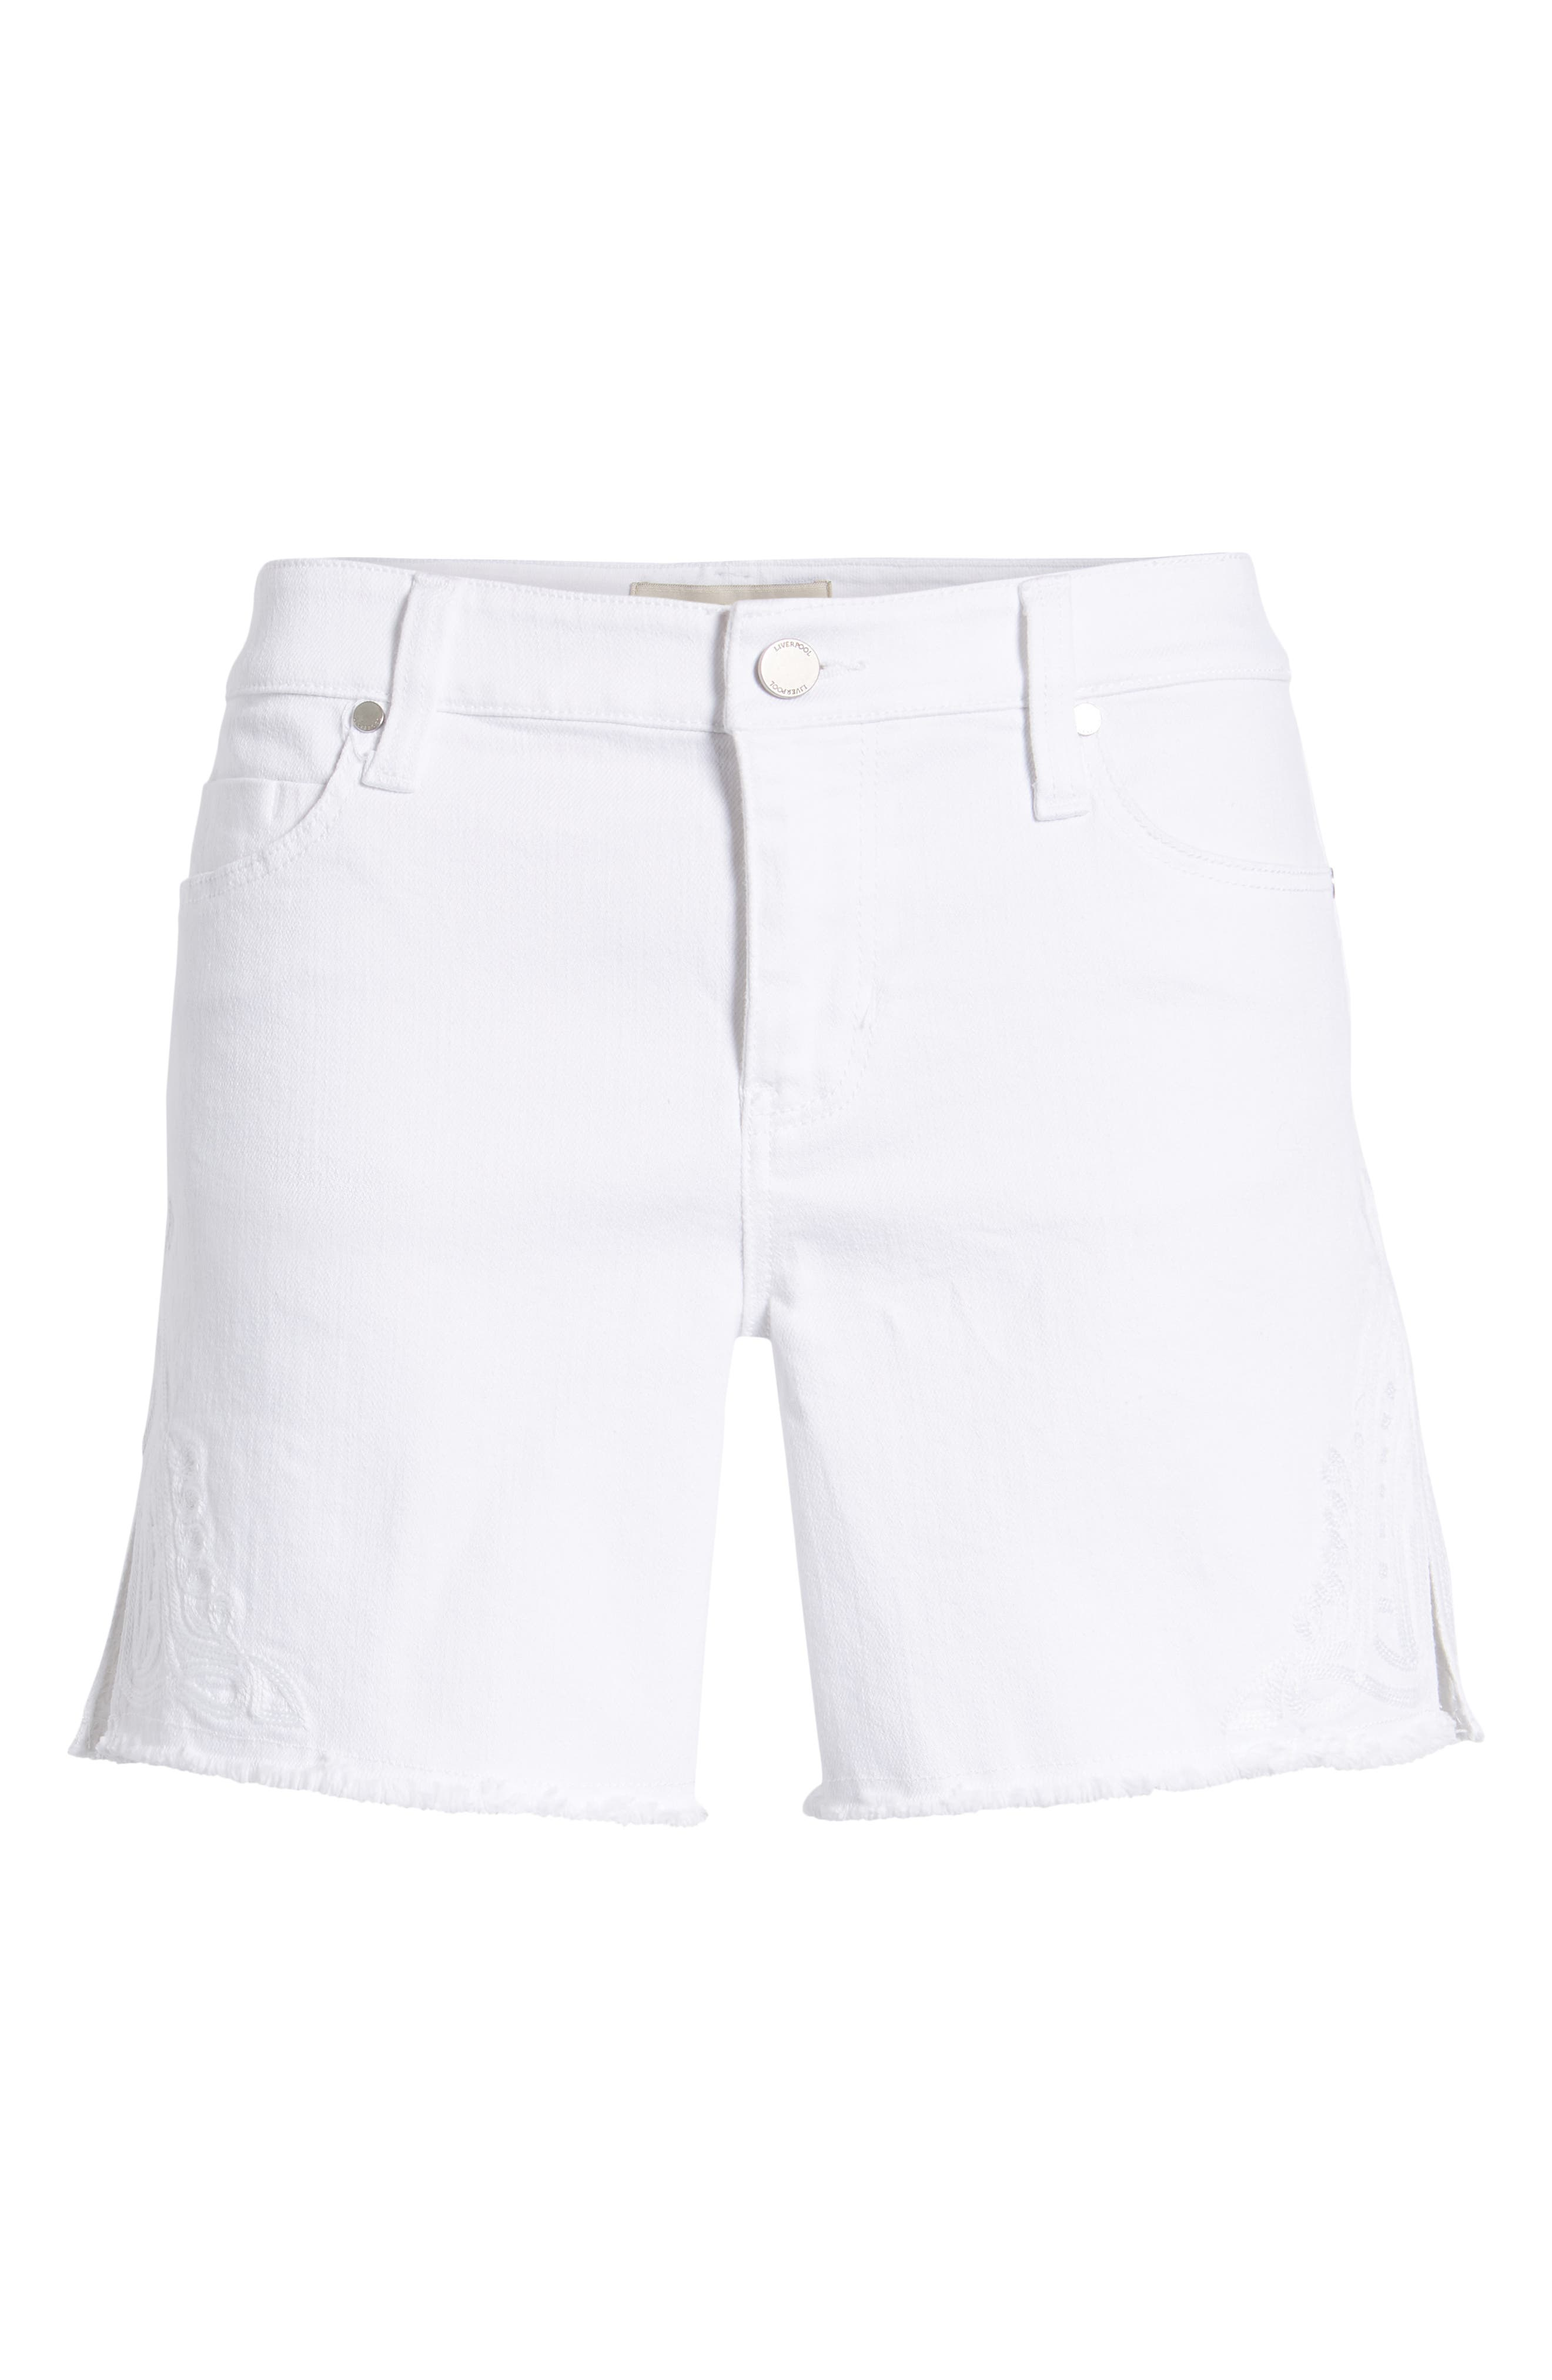 Embroidered Side Slit Shorts,                             Alternate thumbnail 6, color,                             Bright White